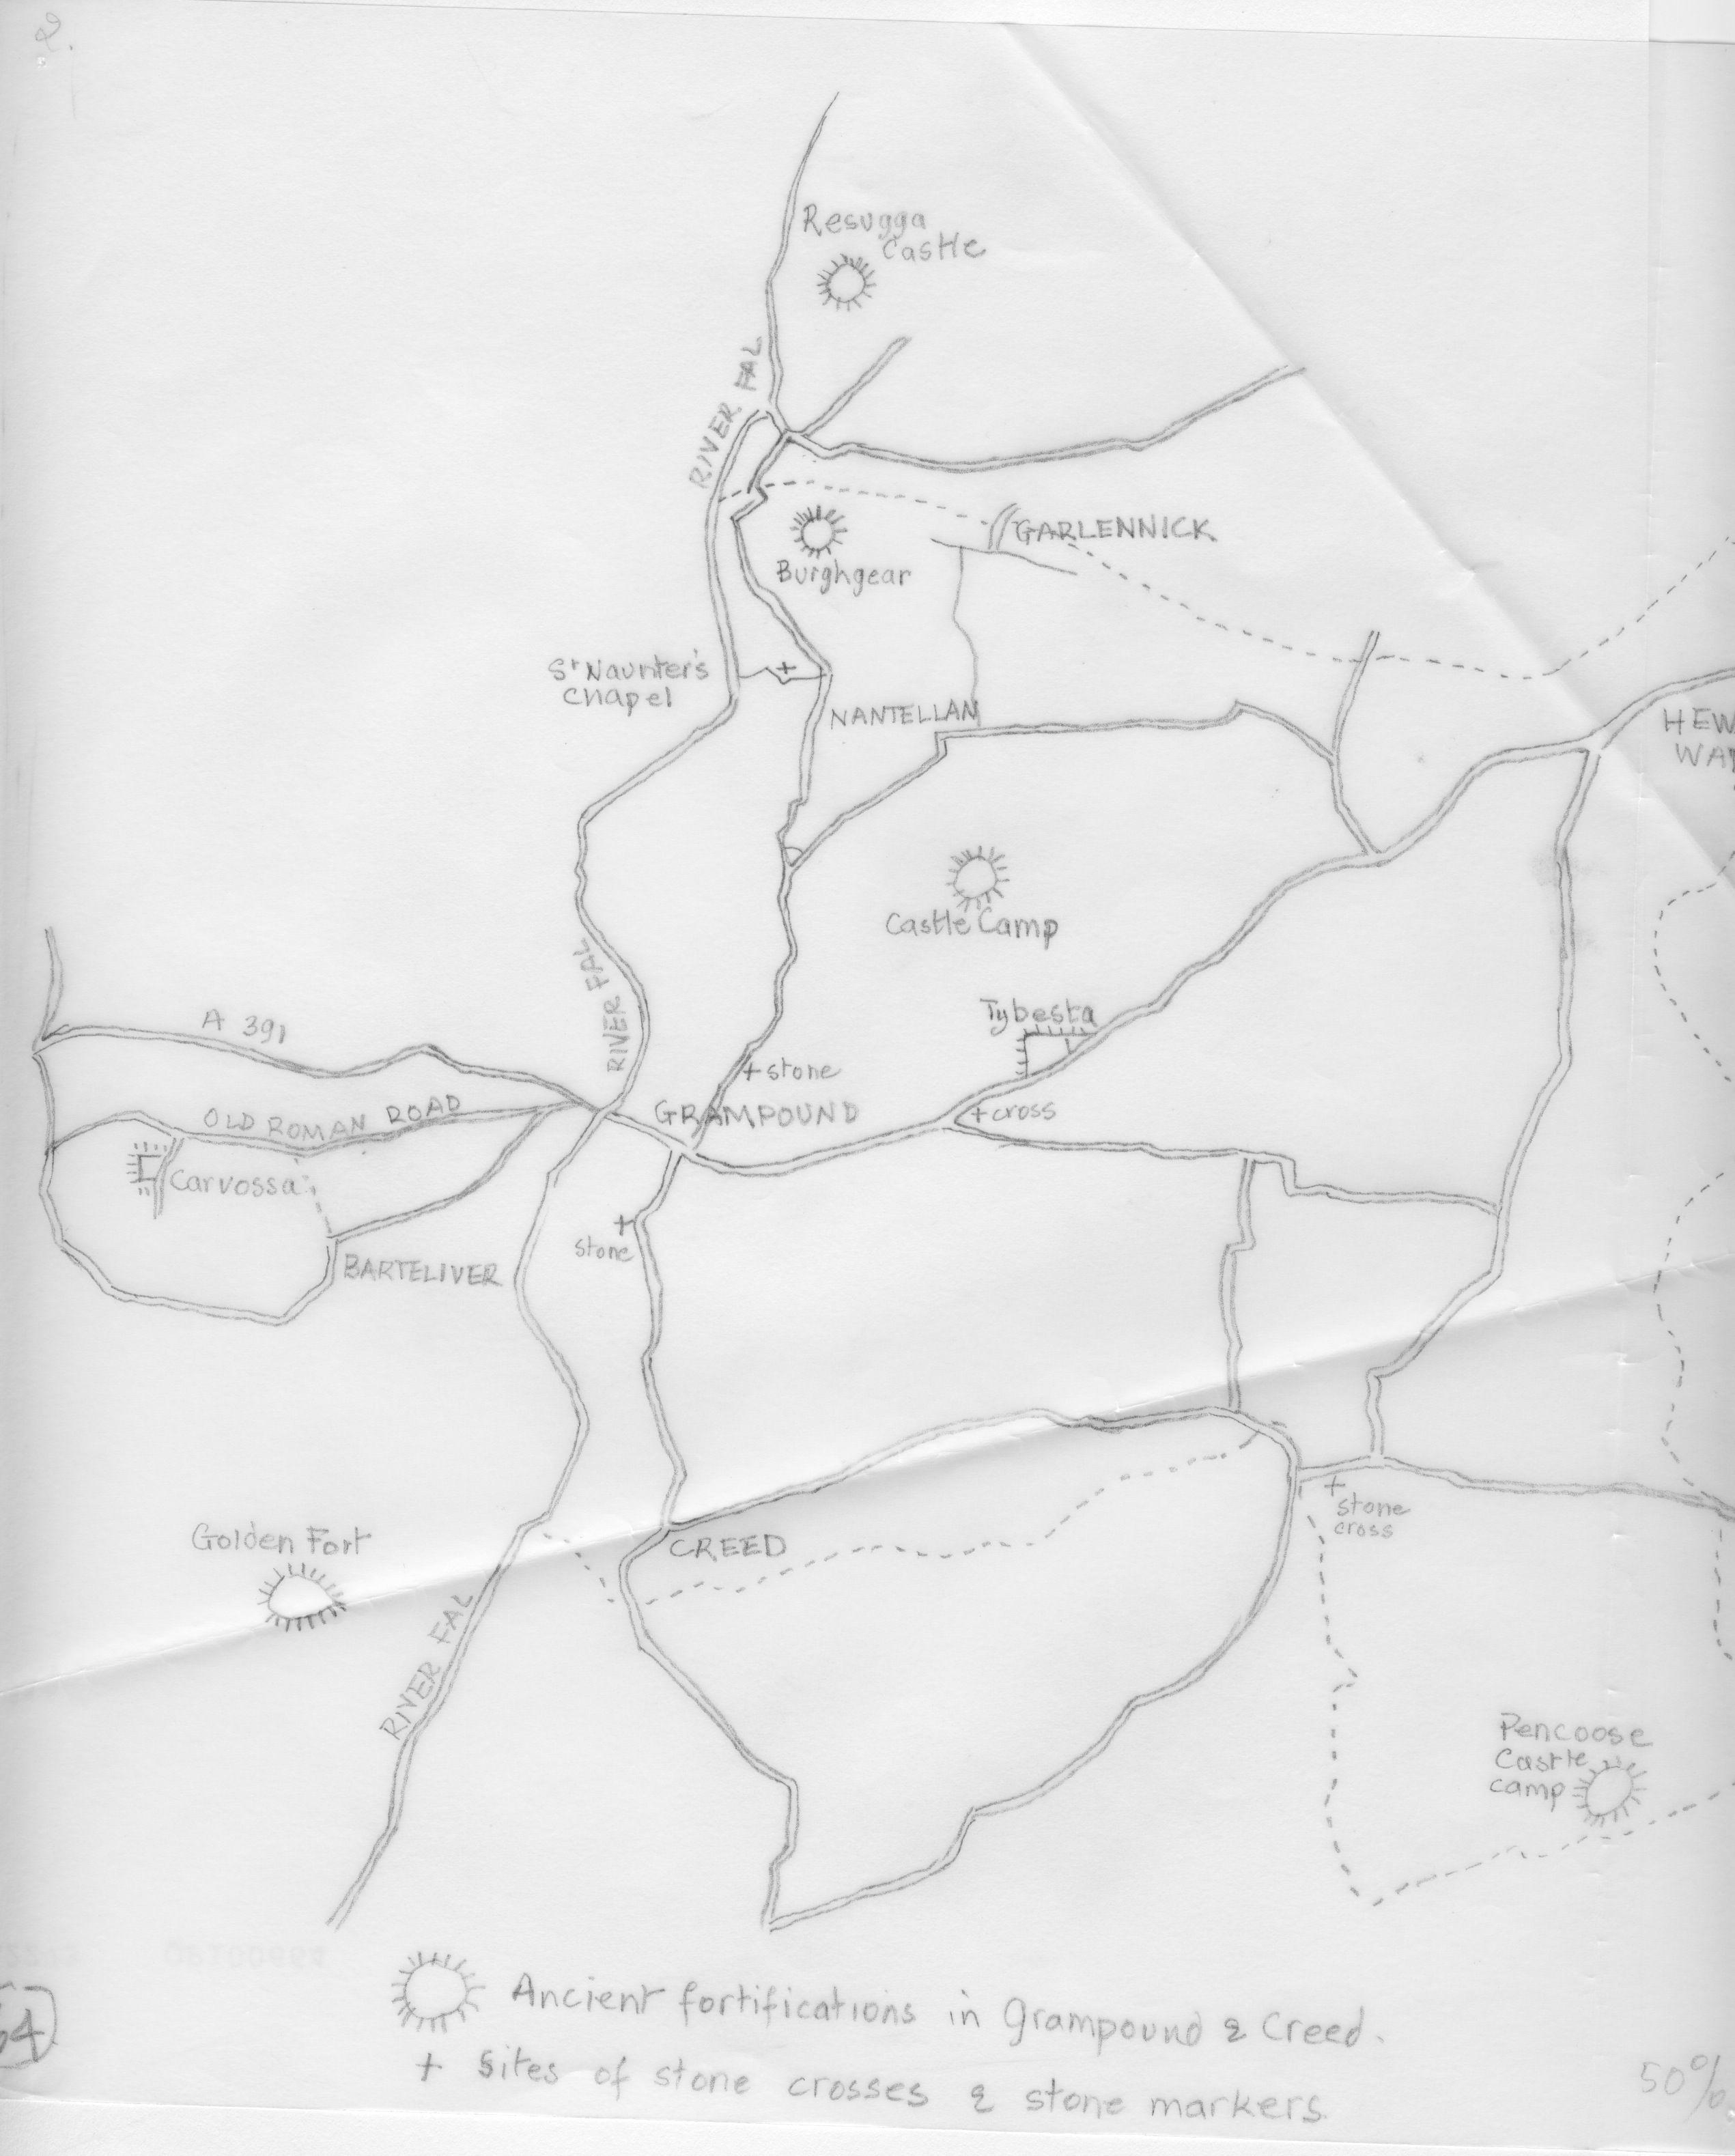 Photos of Maps